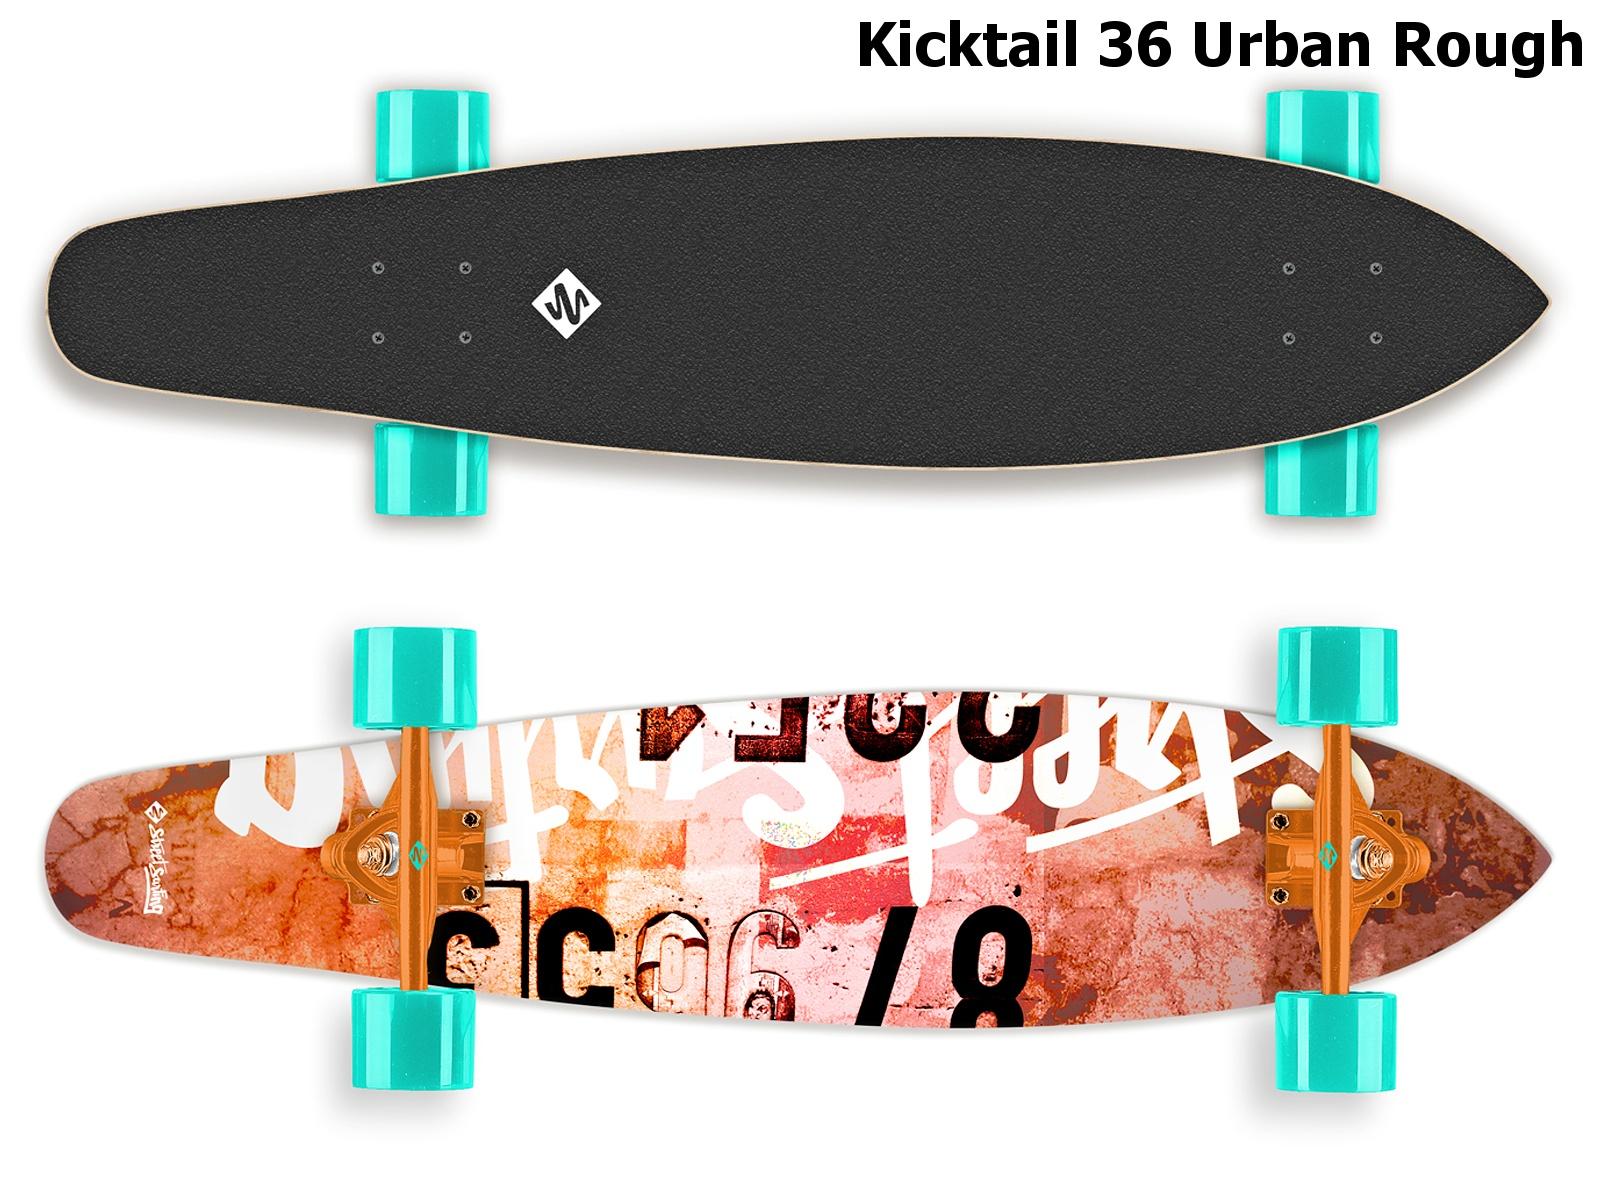 Longboard STREET SURFING Kicktail 36 Urban Rough